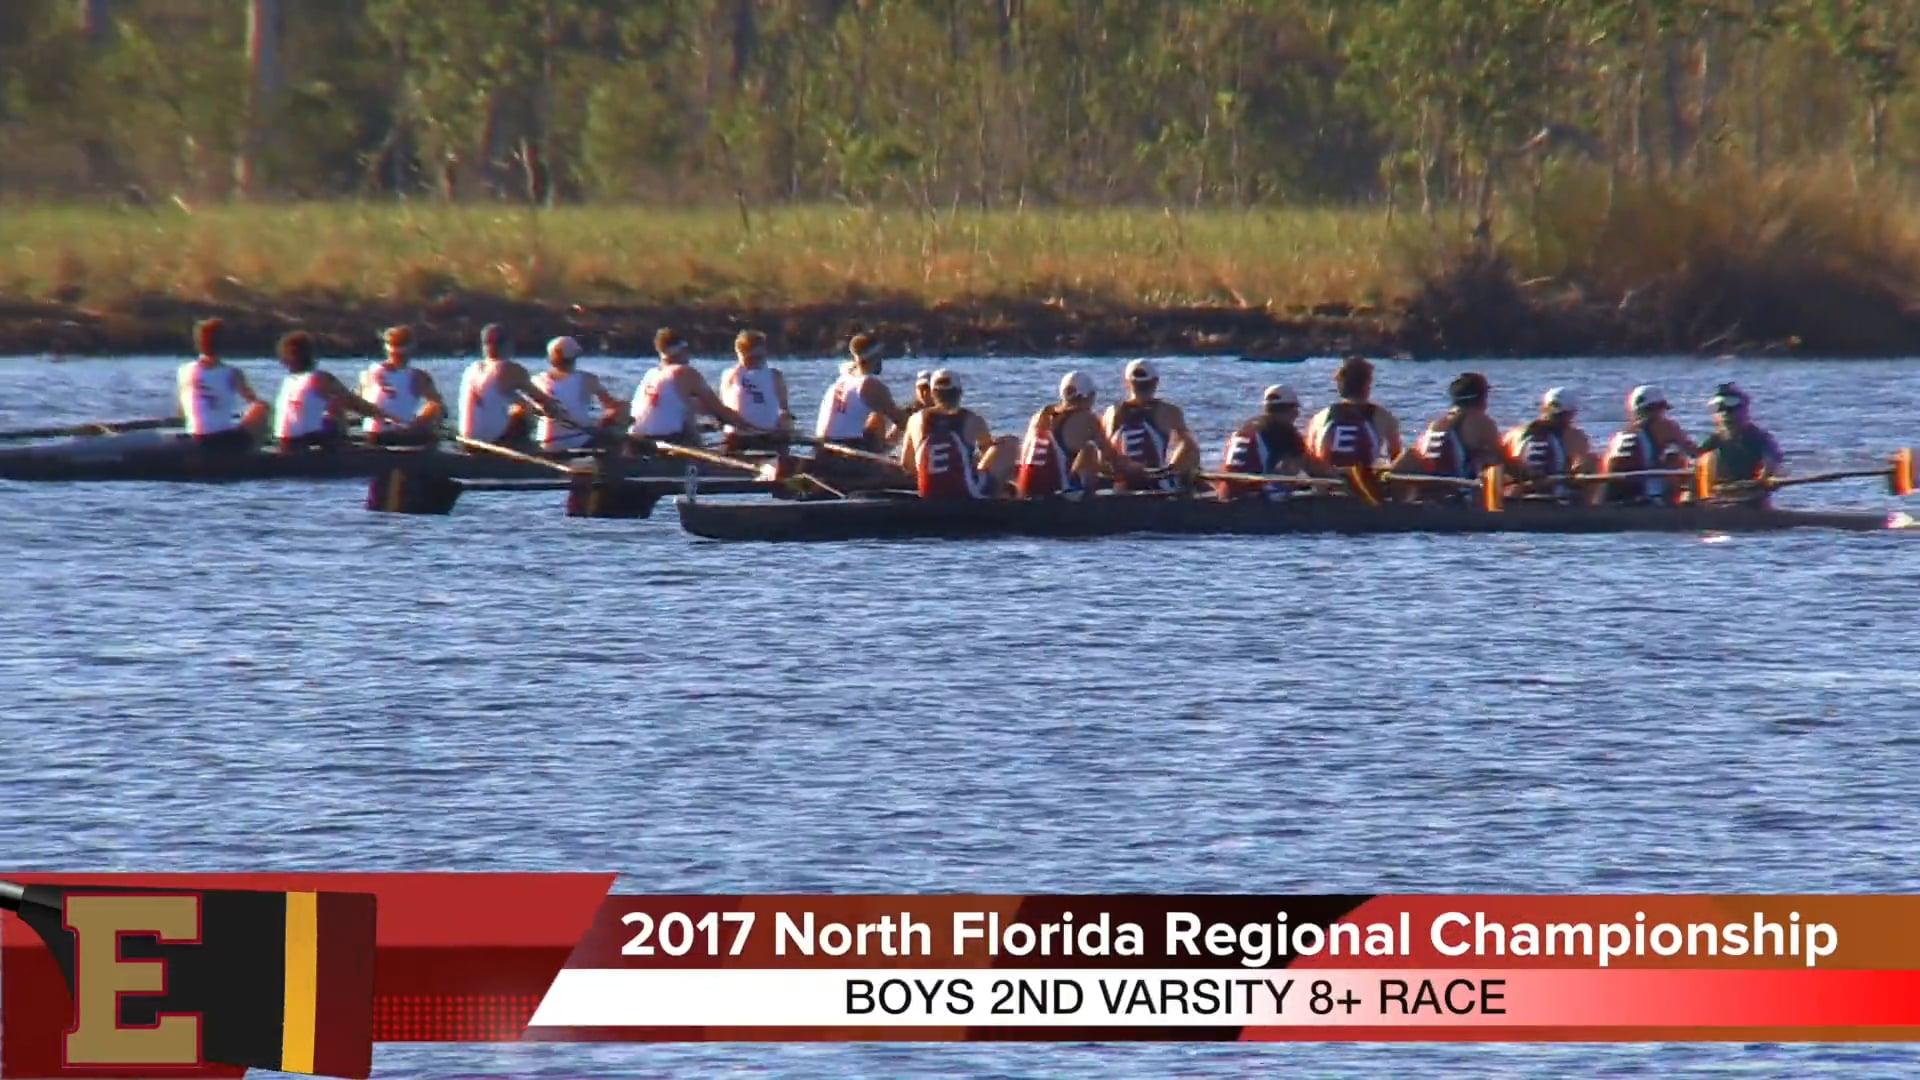 Boys 2V8+ Race 2017 FSRA North Florida Regional Championship